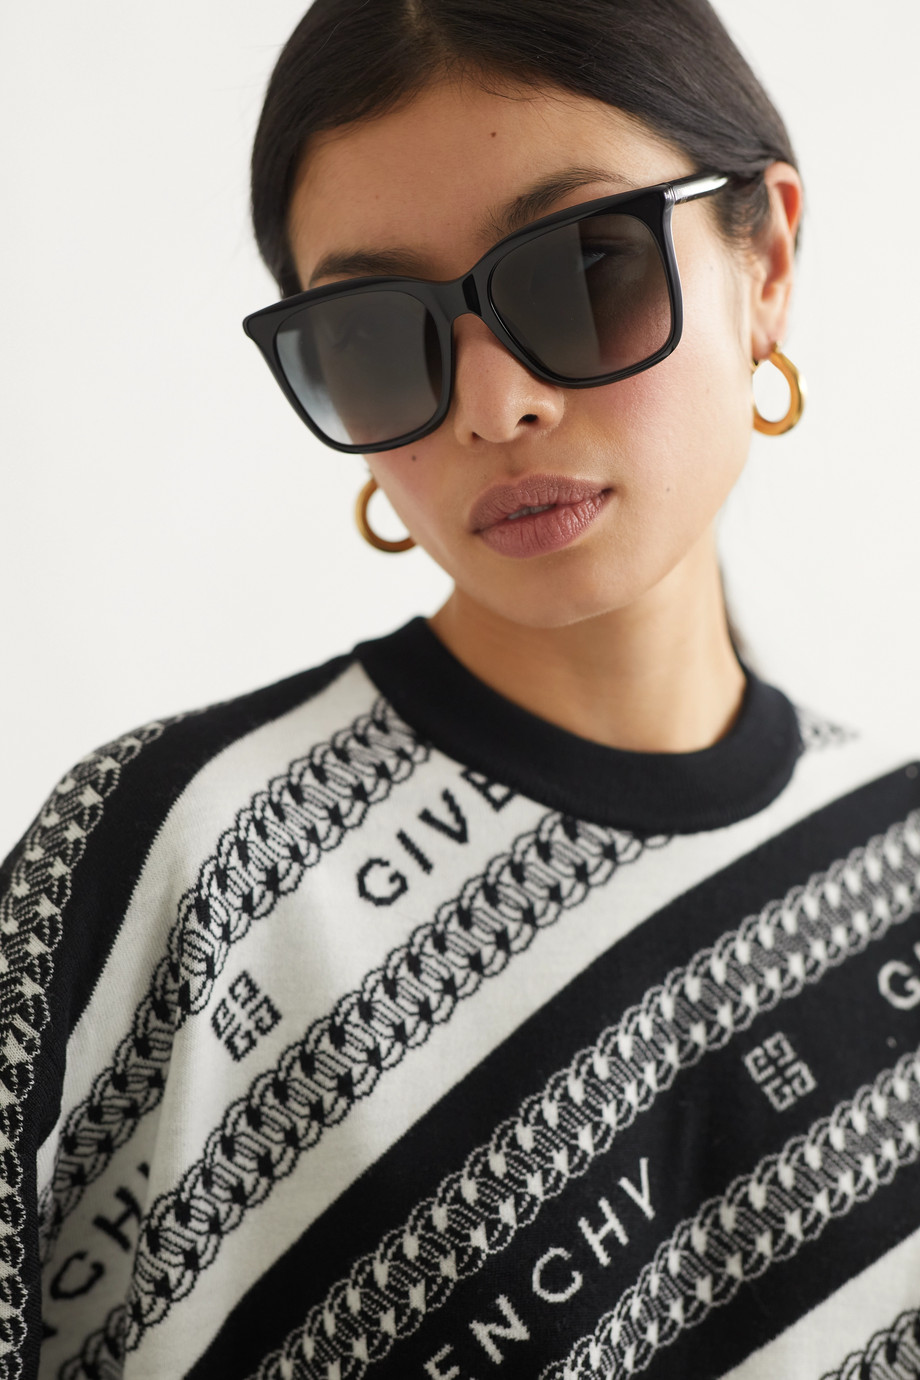 Givenchy D-frame acetate sunglasses